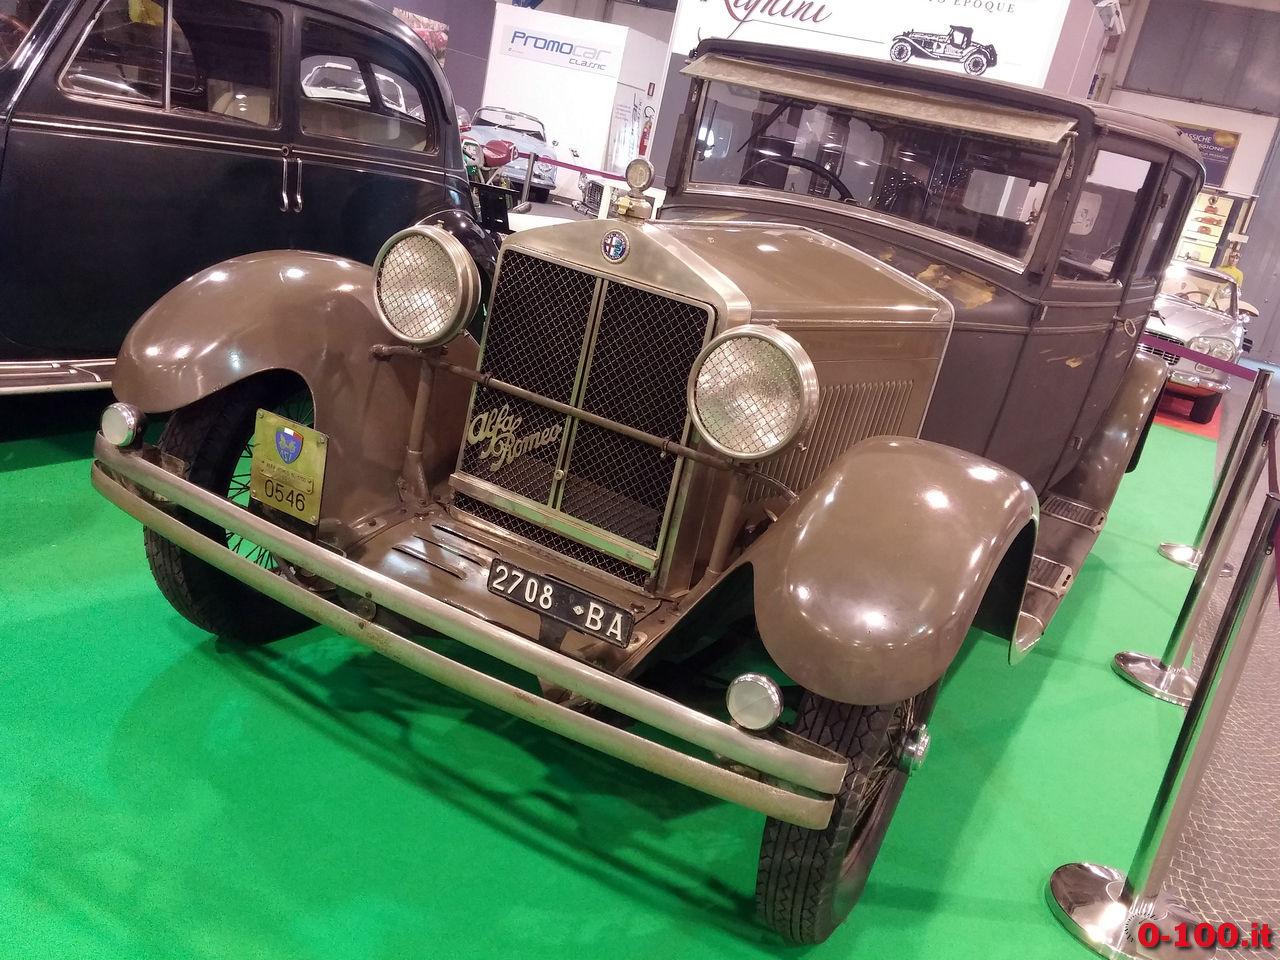 automotodepoca-2016-alfaromeo-car-market-mercato-auto-prezzo-price_0-10077